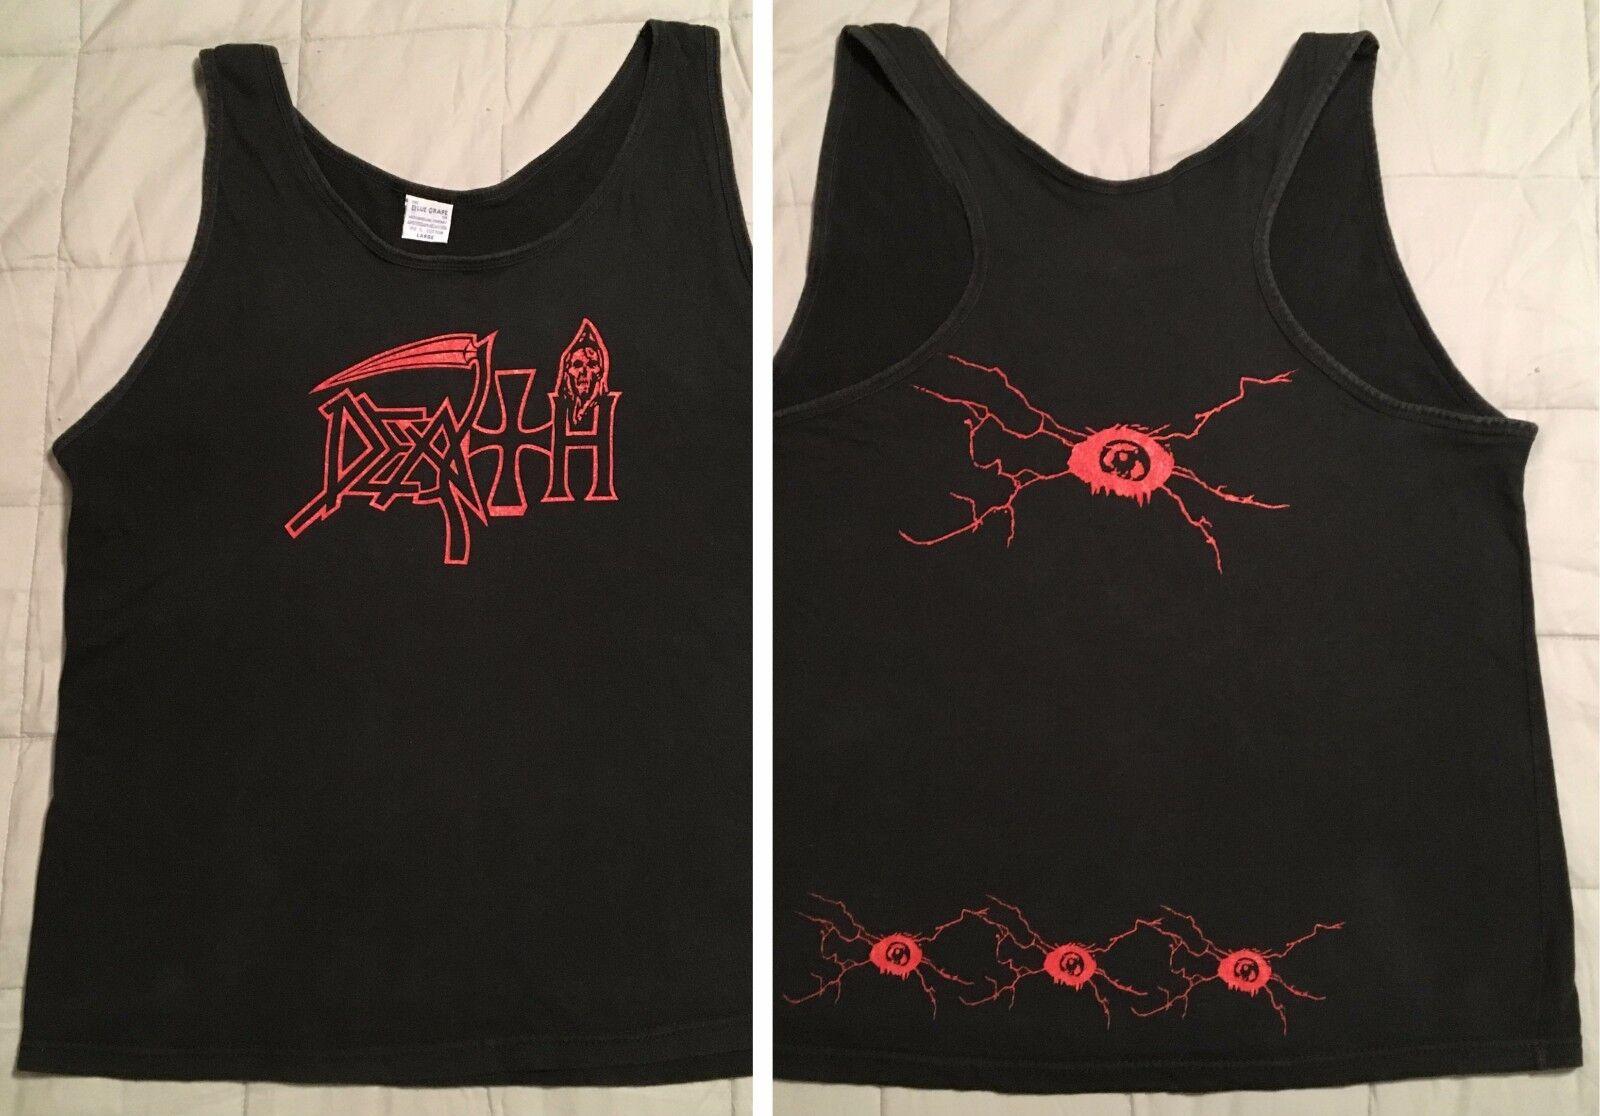 DEATH Rare 1995 Vtg Tank Top Symbolic Tour T-Shirt Chuck Schuldiner cynic metal